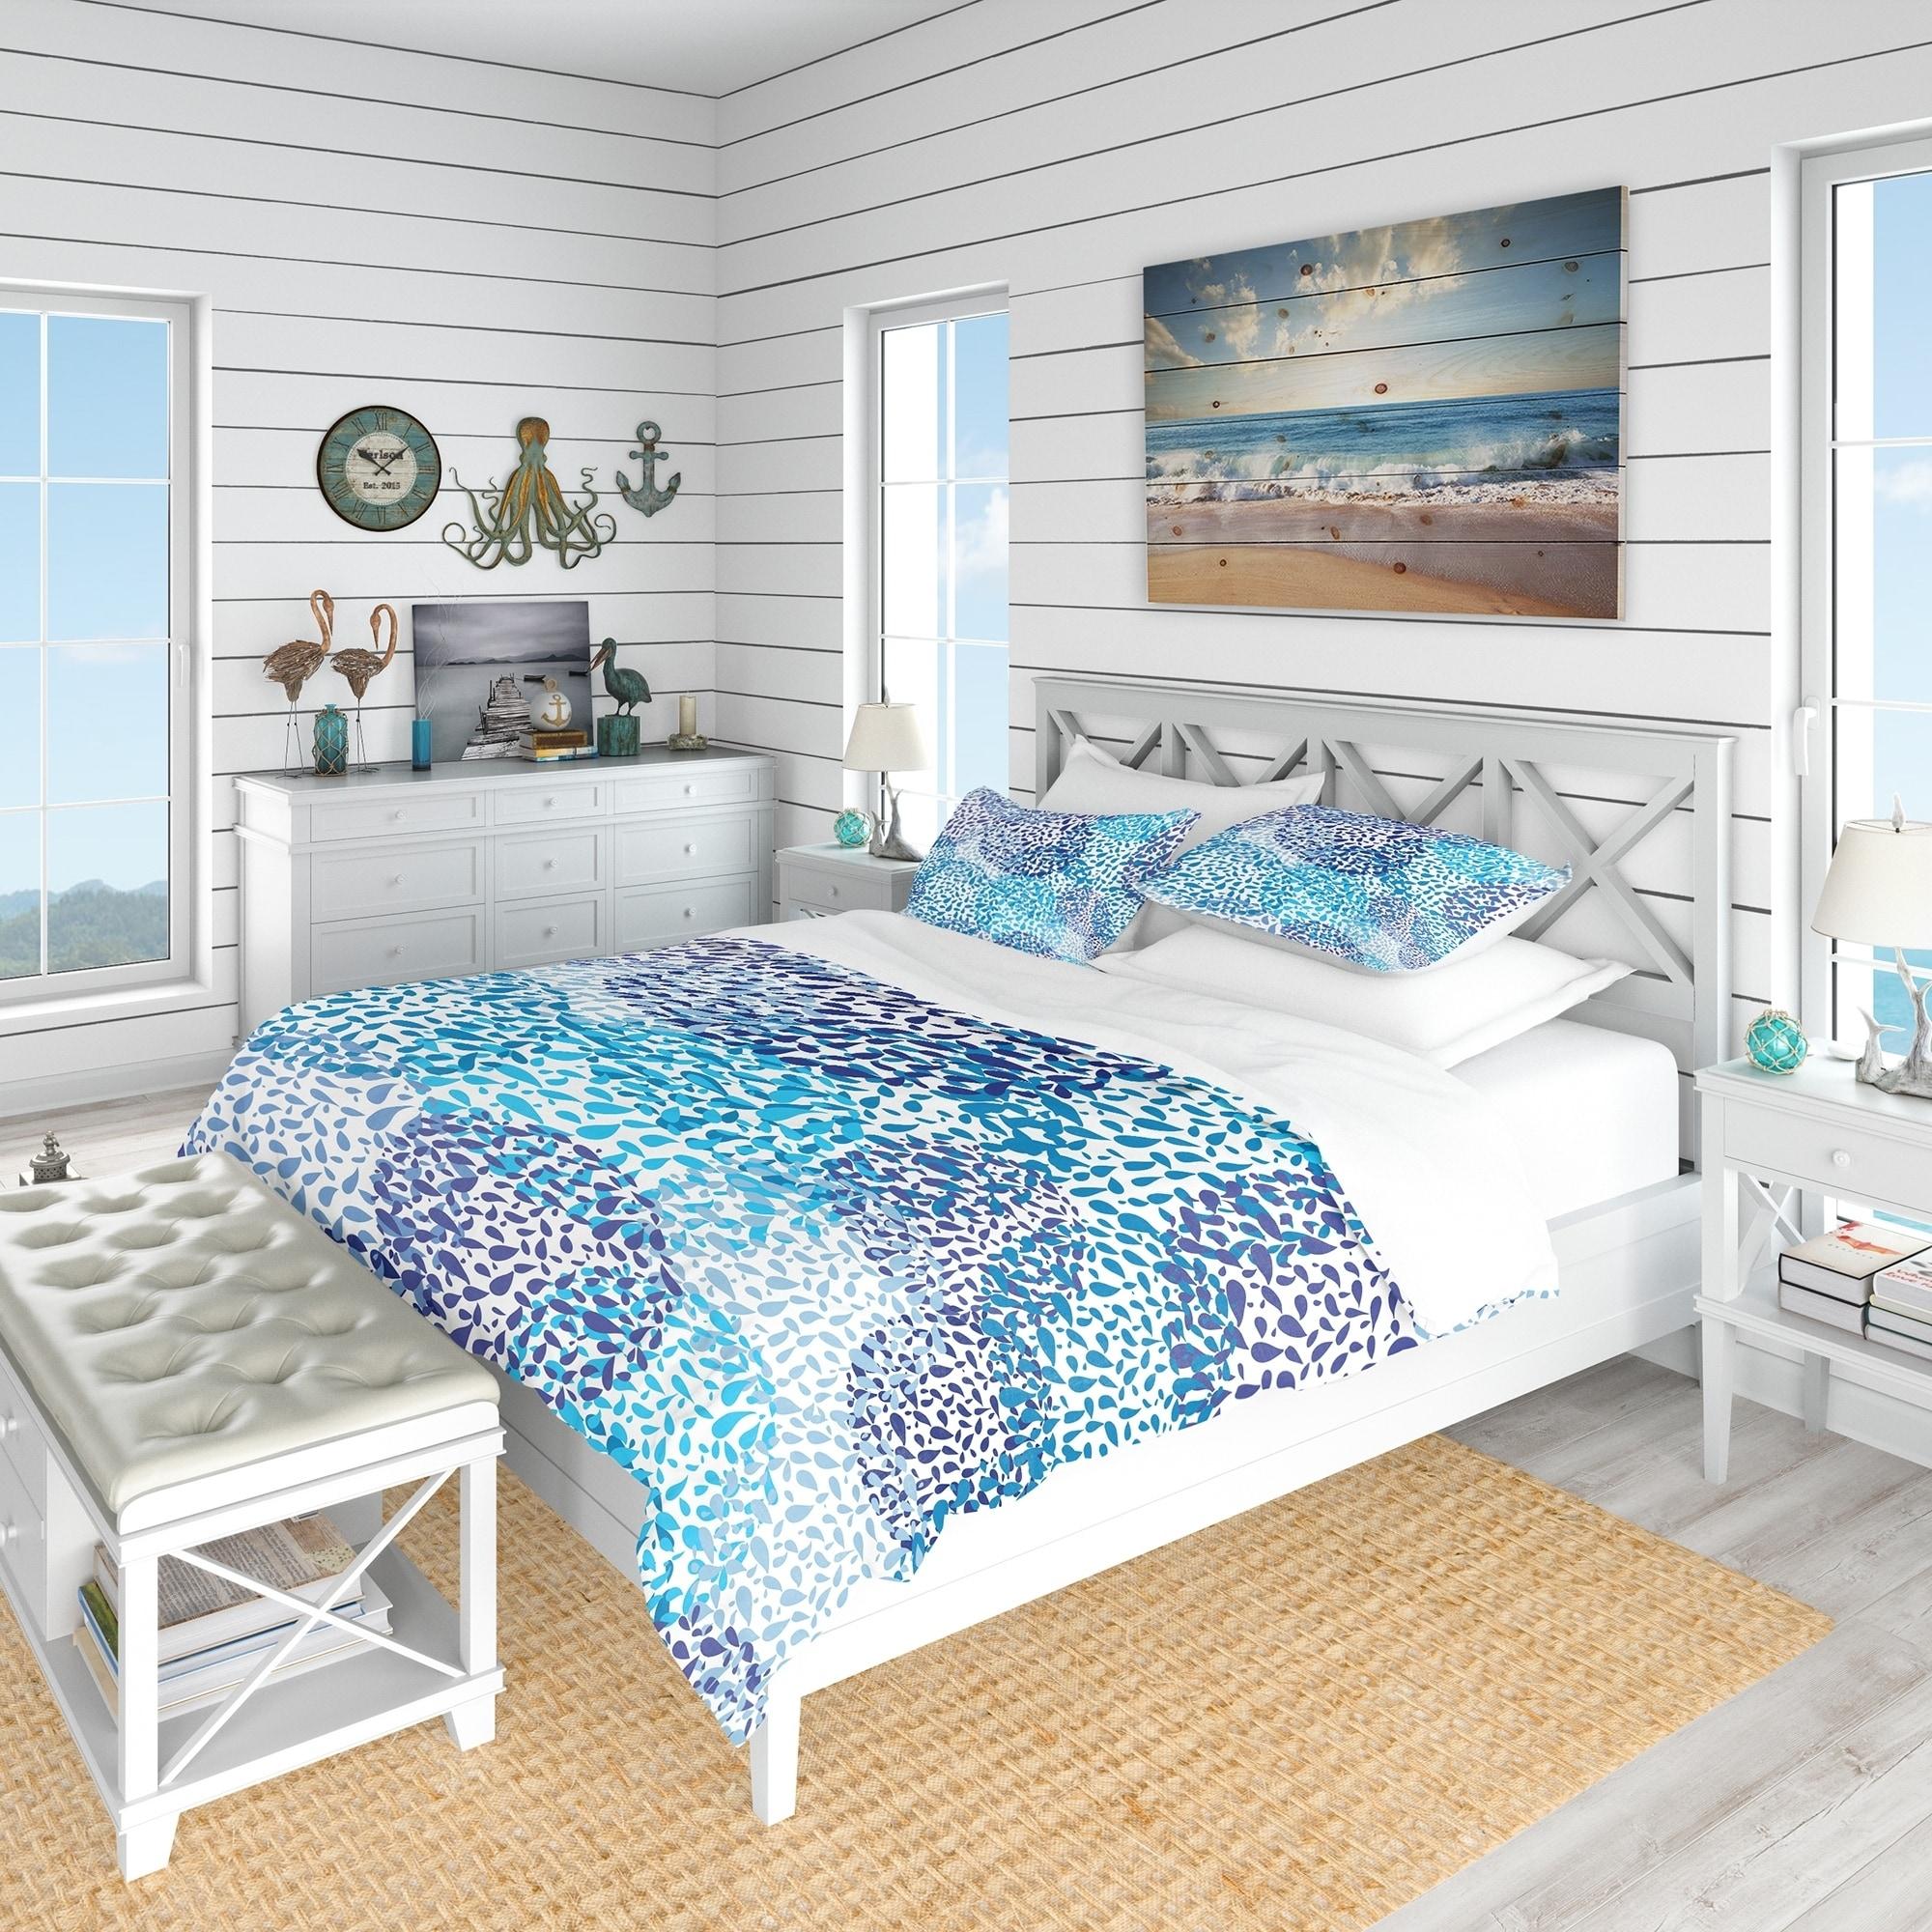 Charmant Designart U0027Sea Motif Patternu0027 Nautical U0026 Coastal Bedding Set   Duvet Cover  U0026 Shams